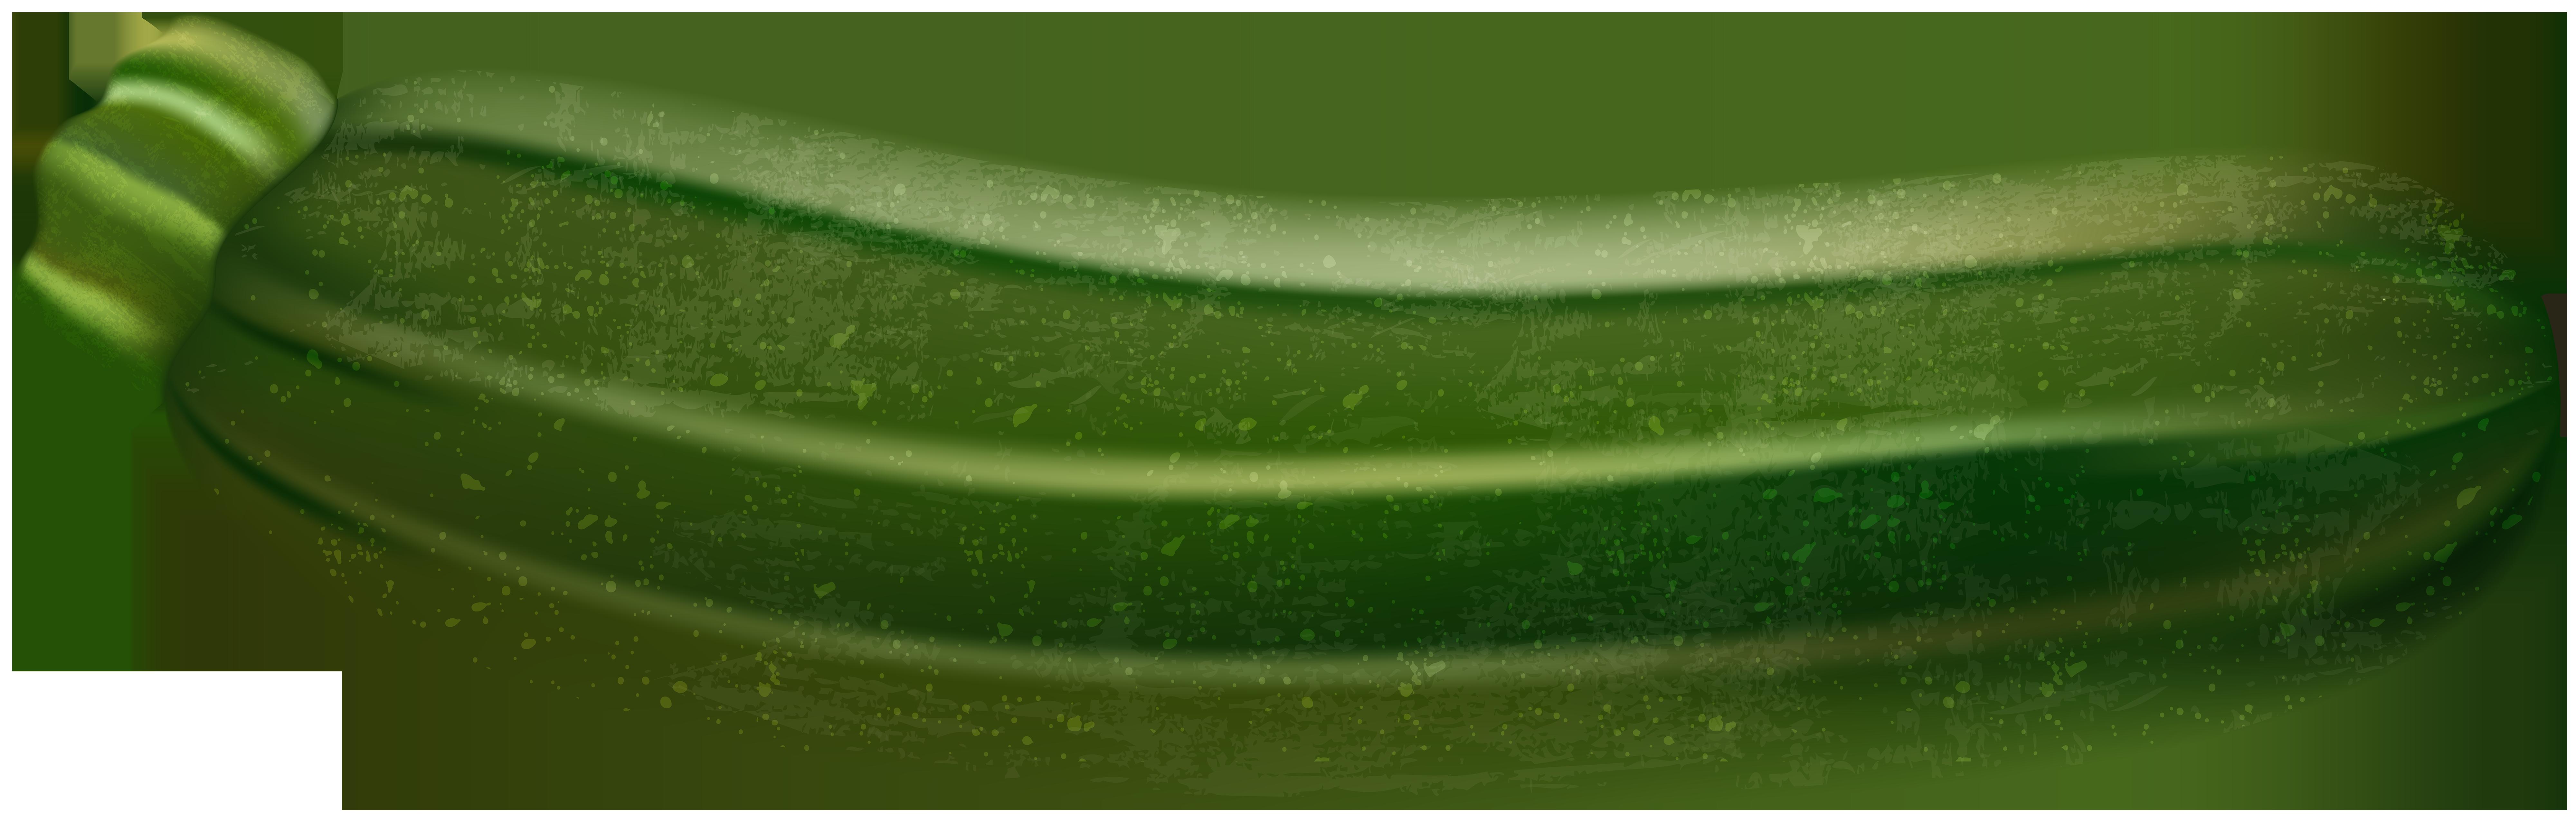 Zucchini clipart. Transparent png clip art